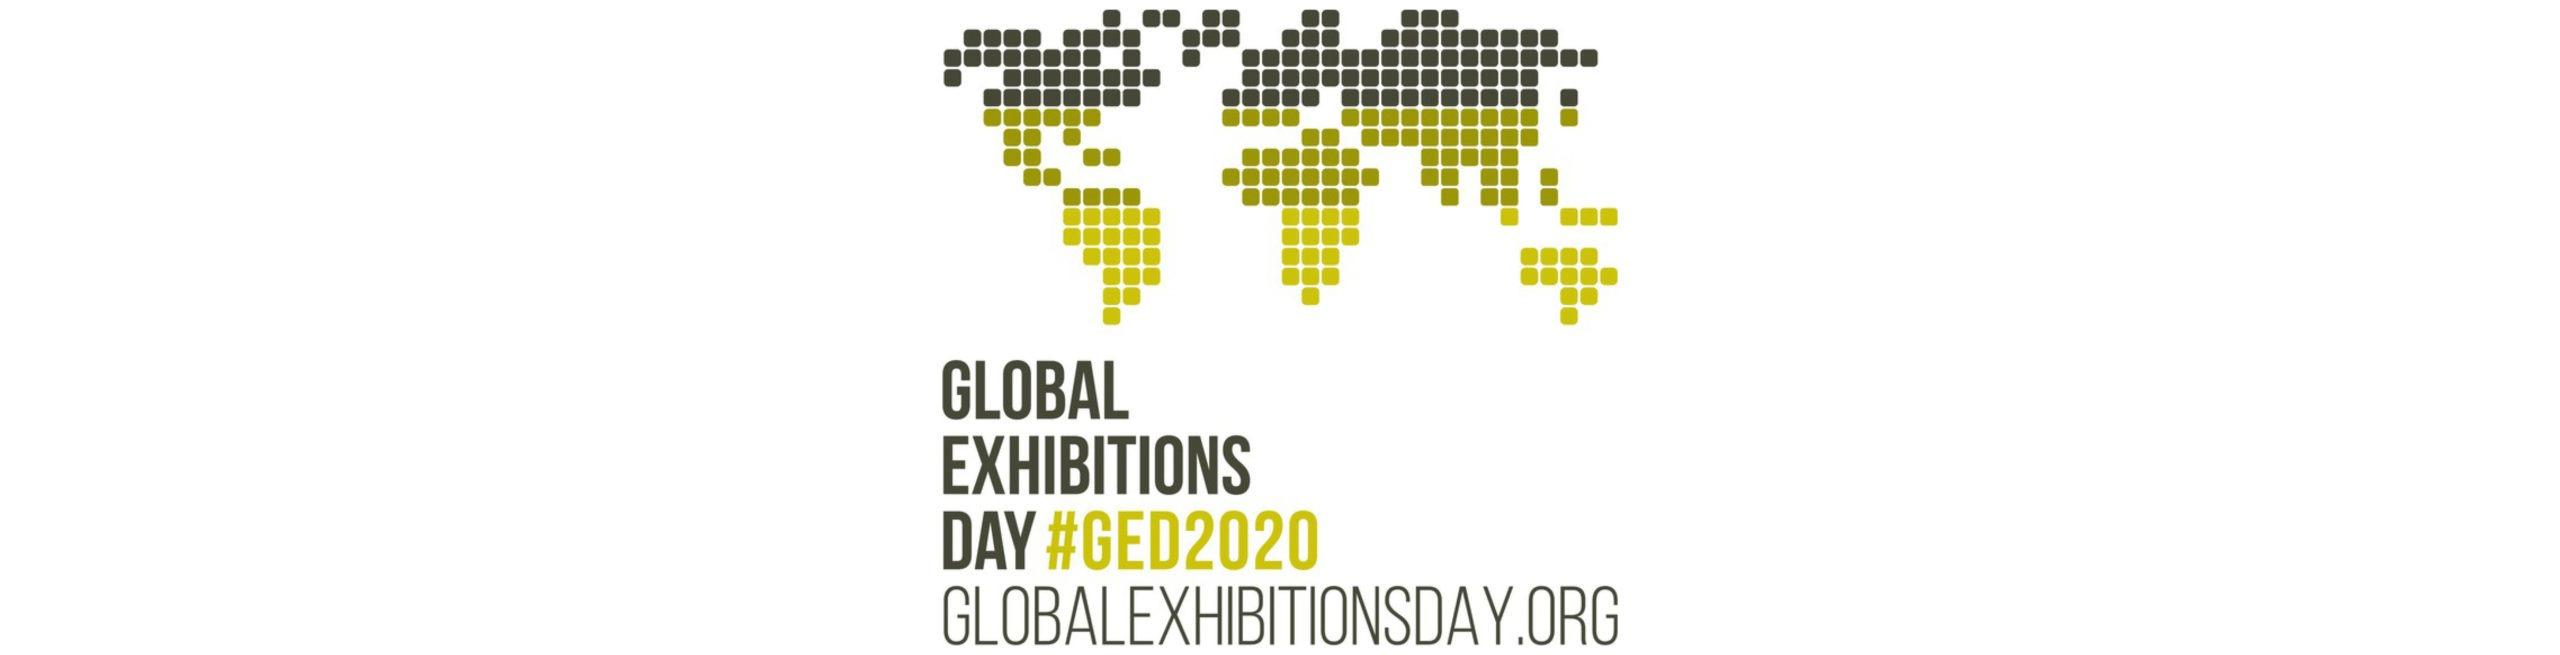 #GED2020 | CTICC